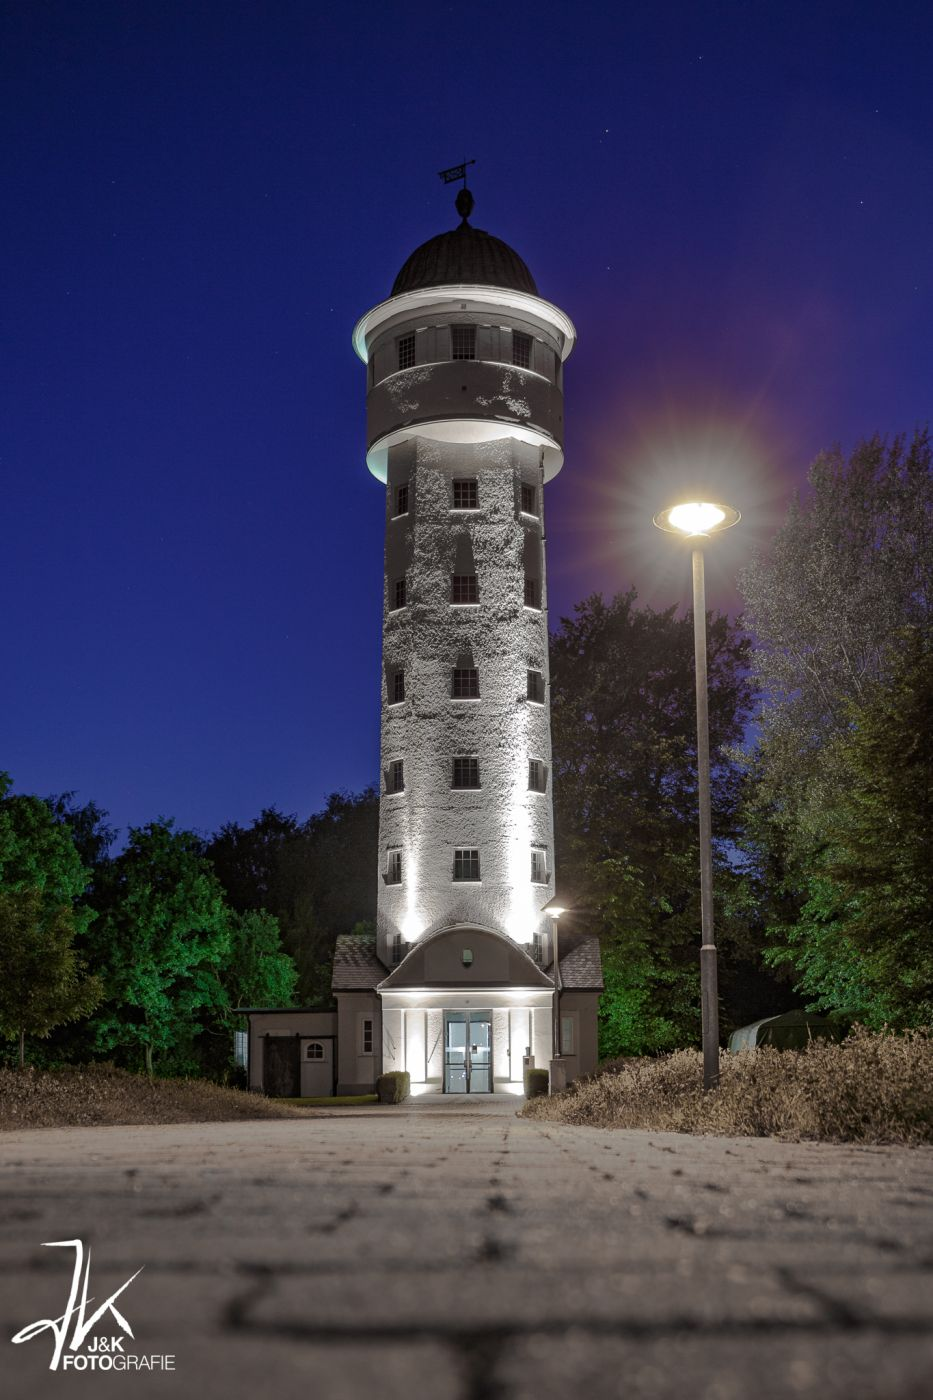 Wasserturm, Konstanz, Germany